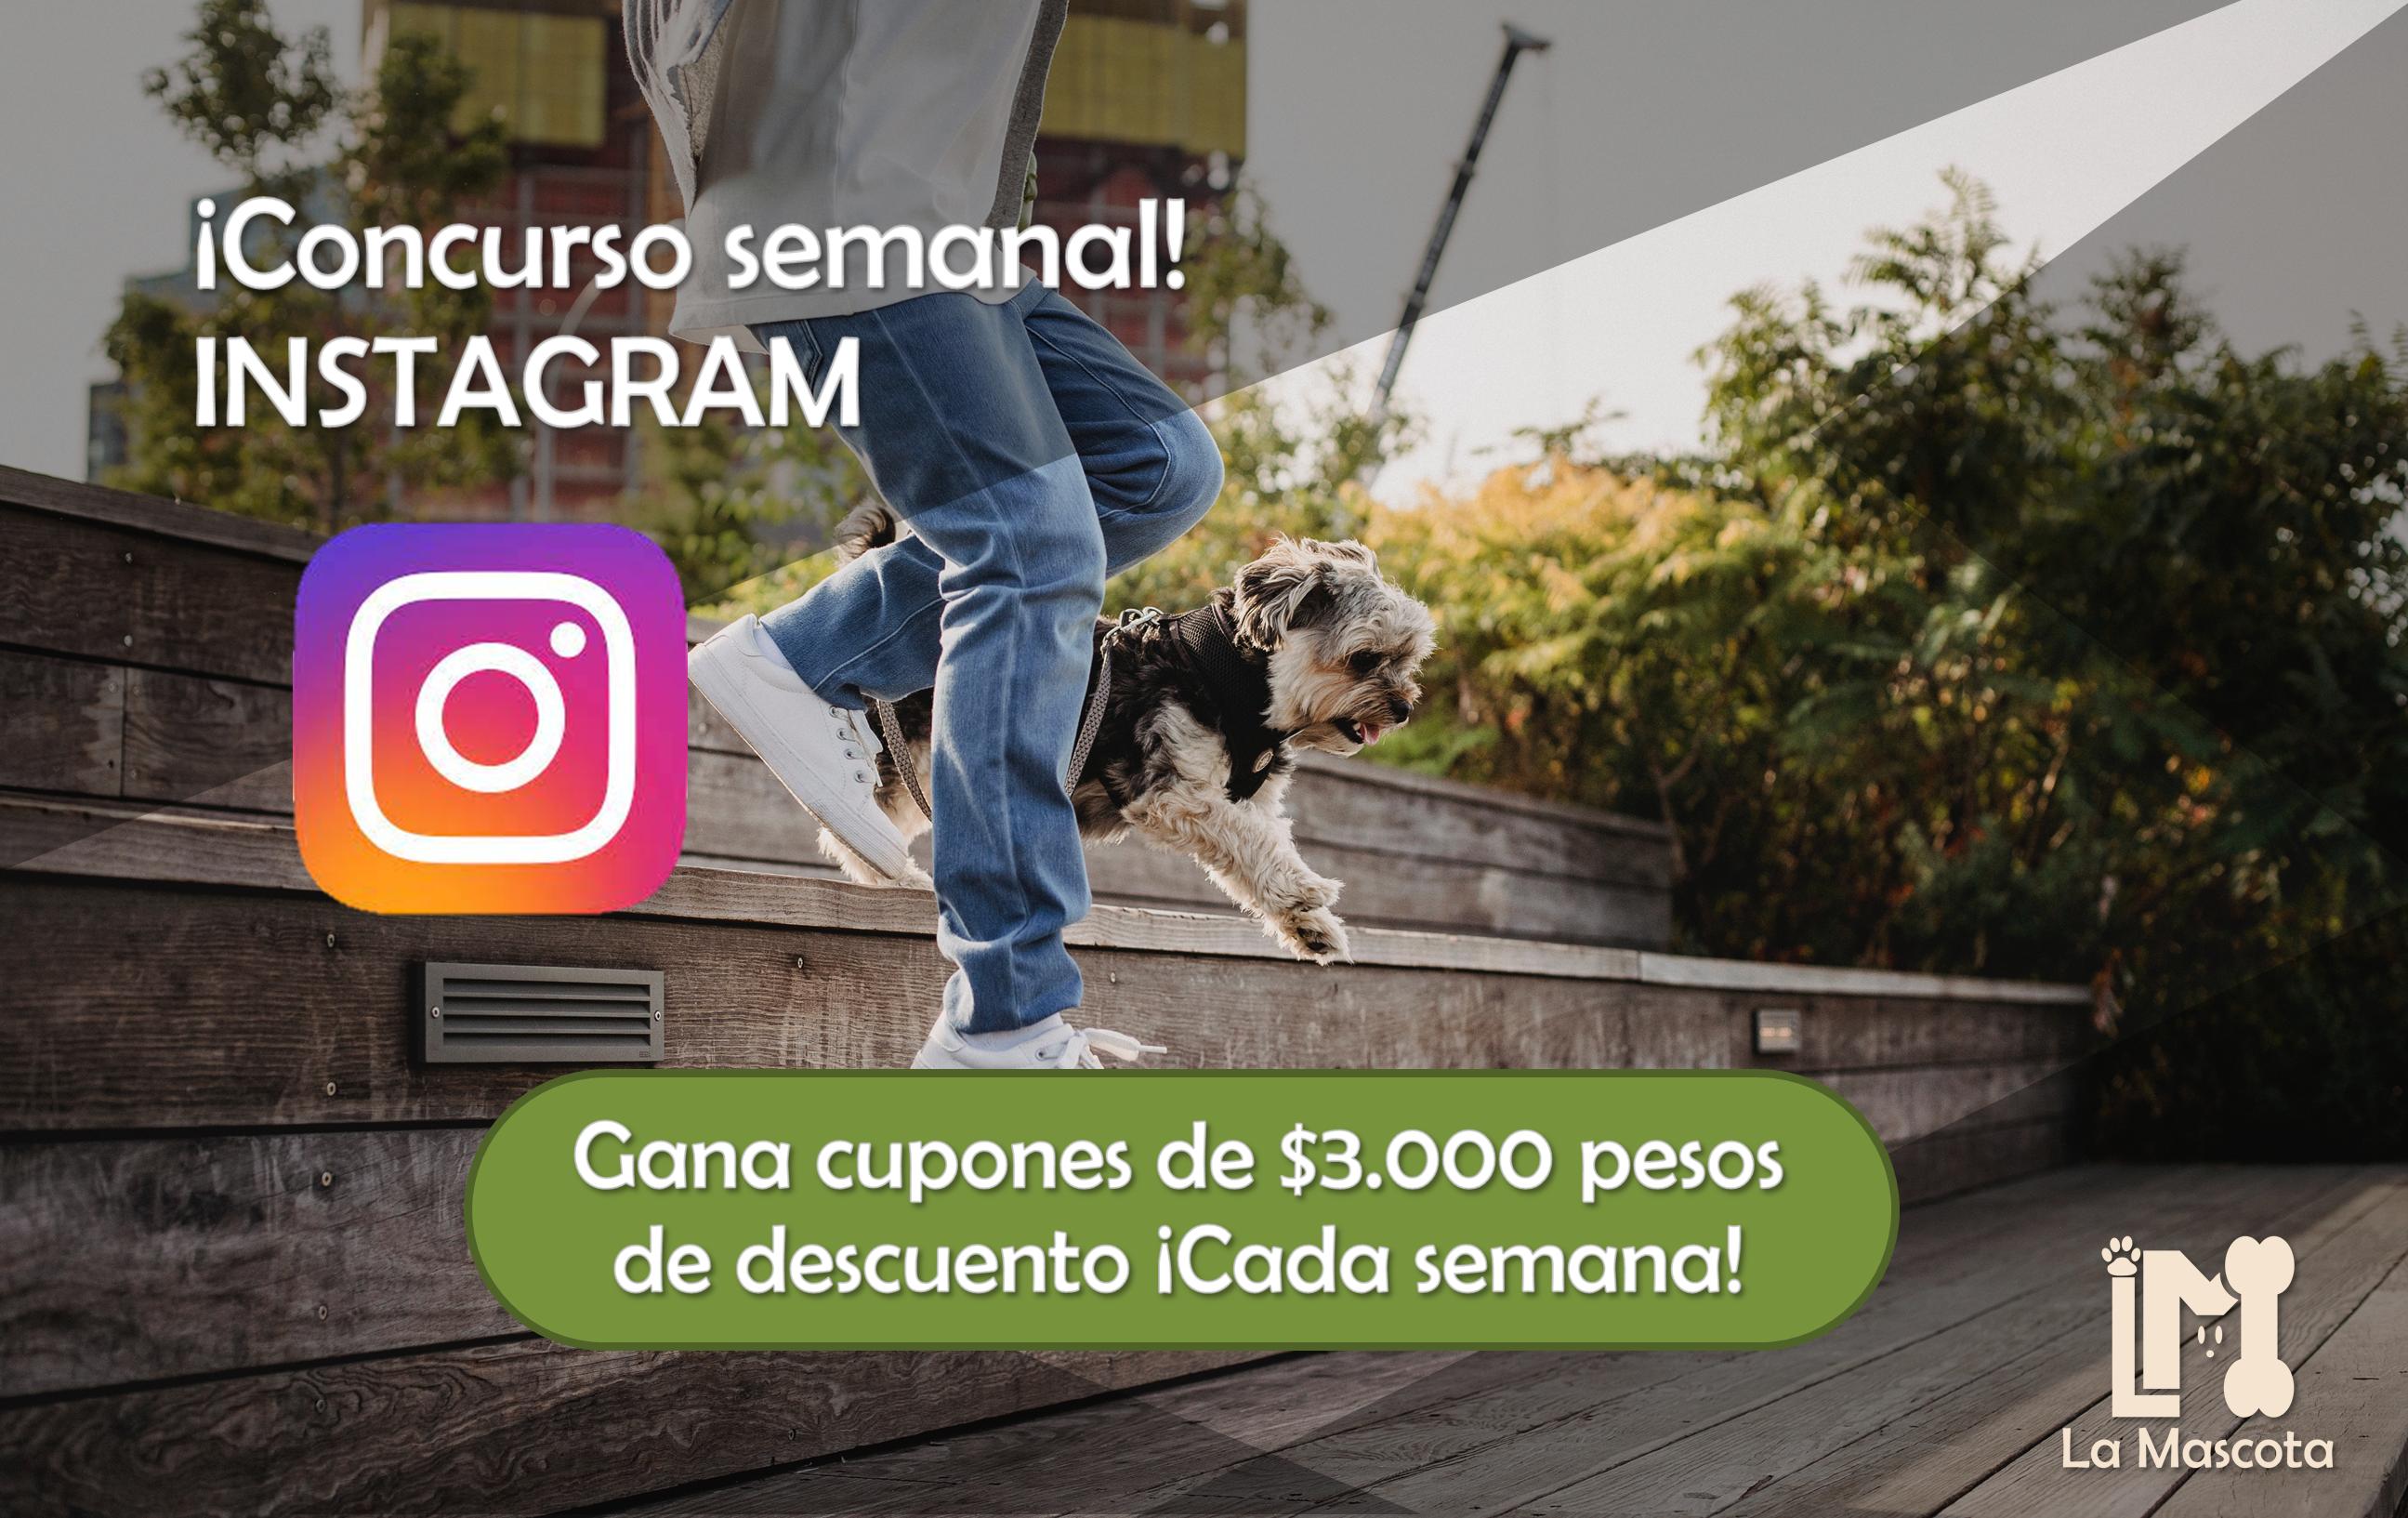 Concurso Semanal Instagram